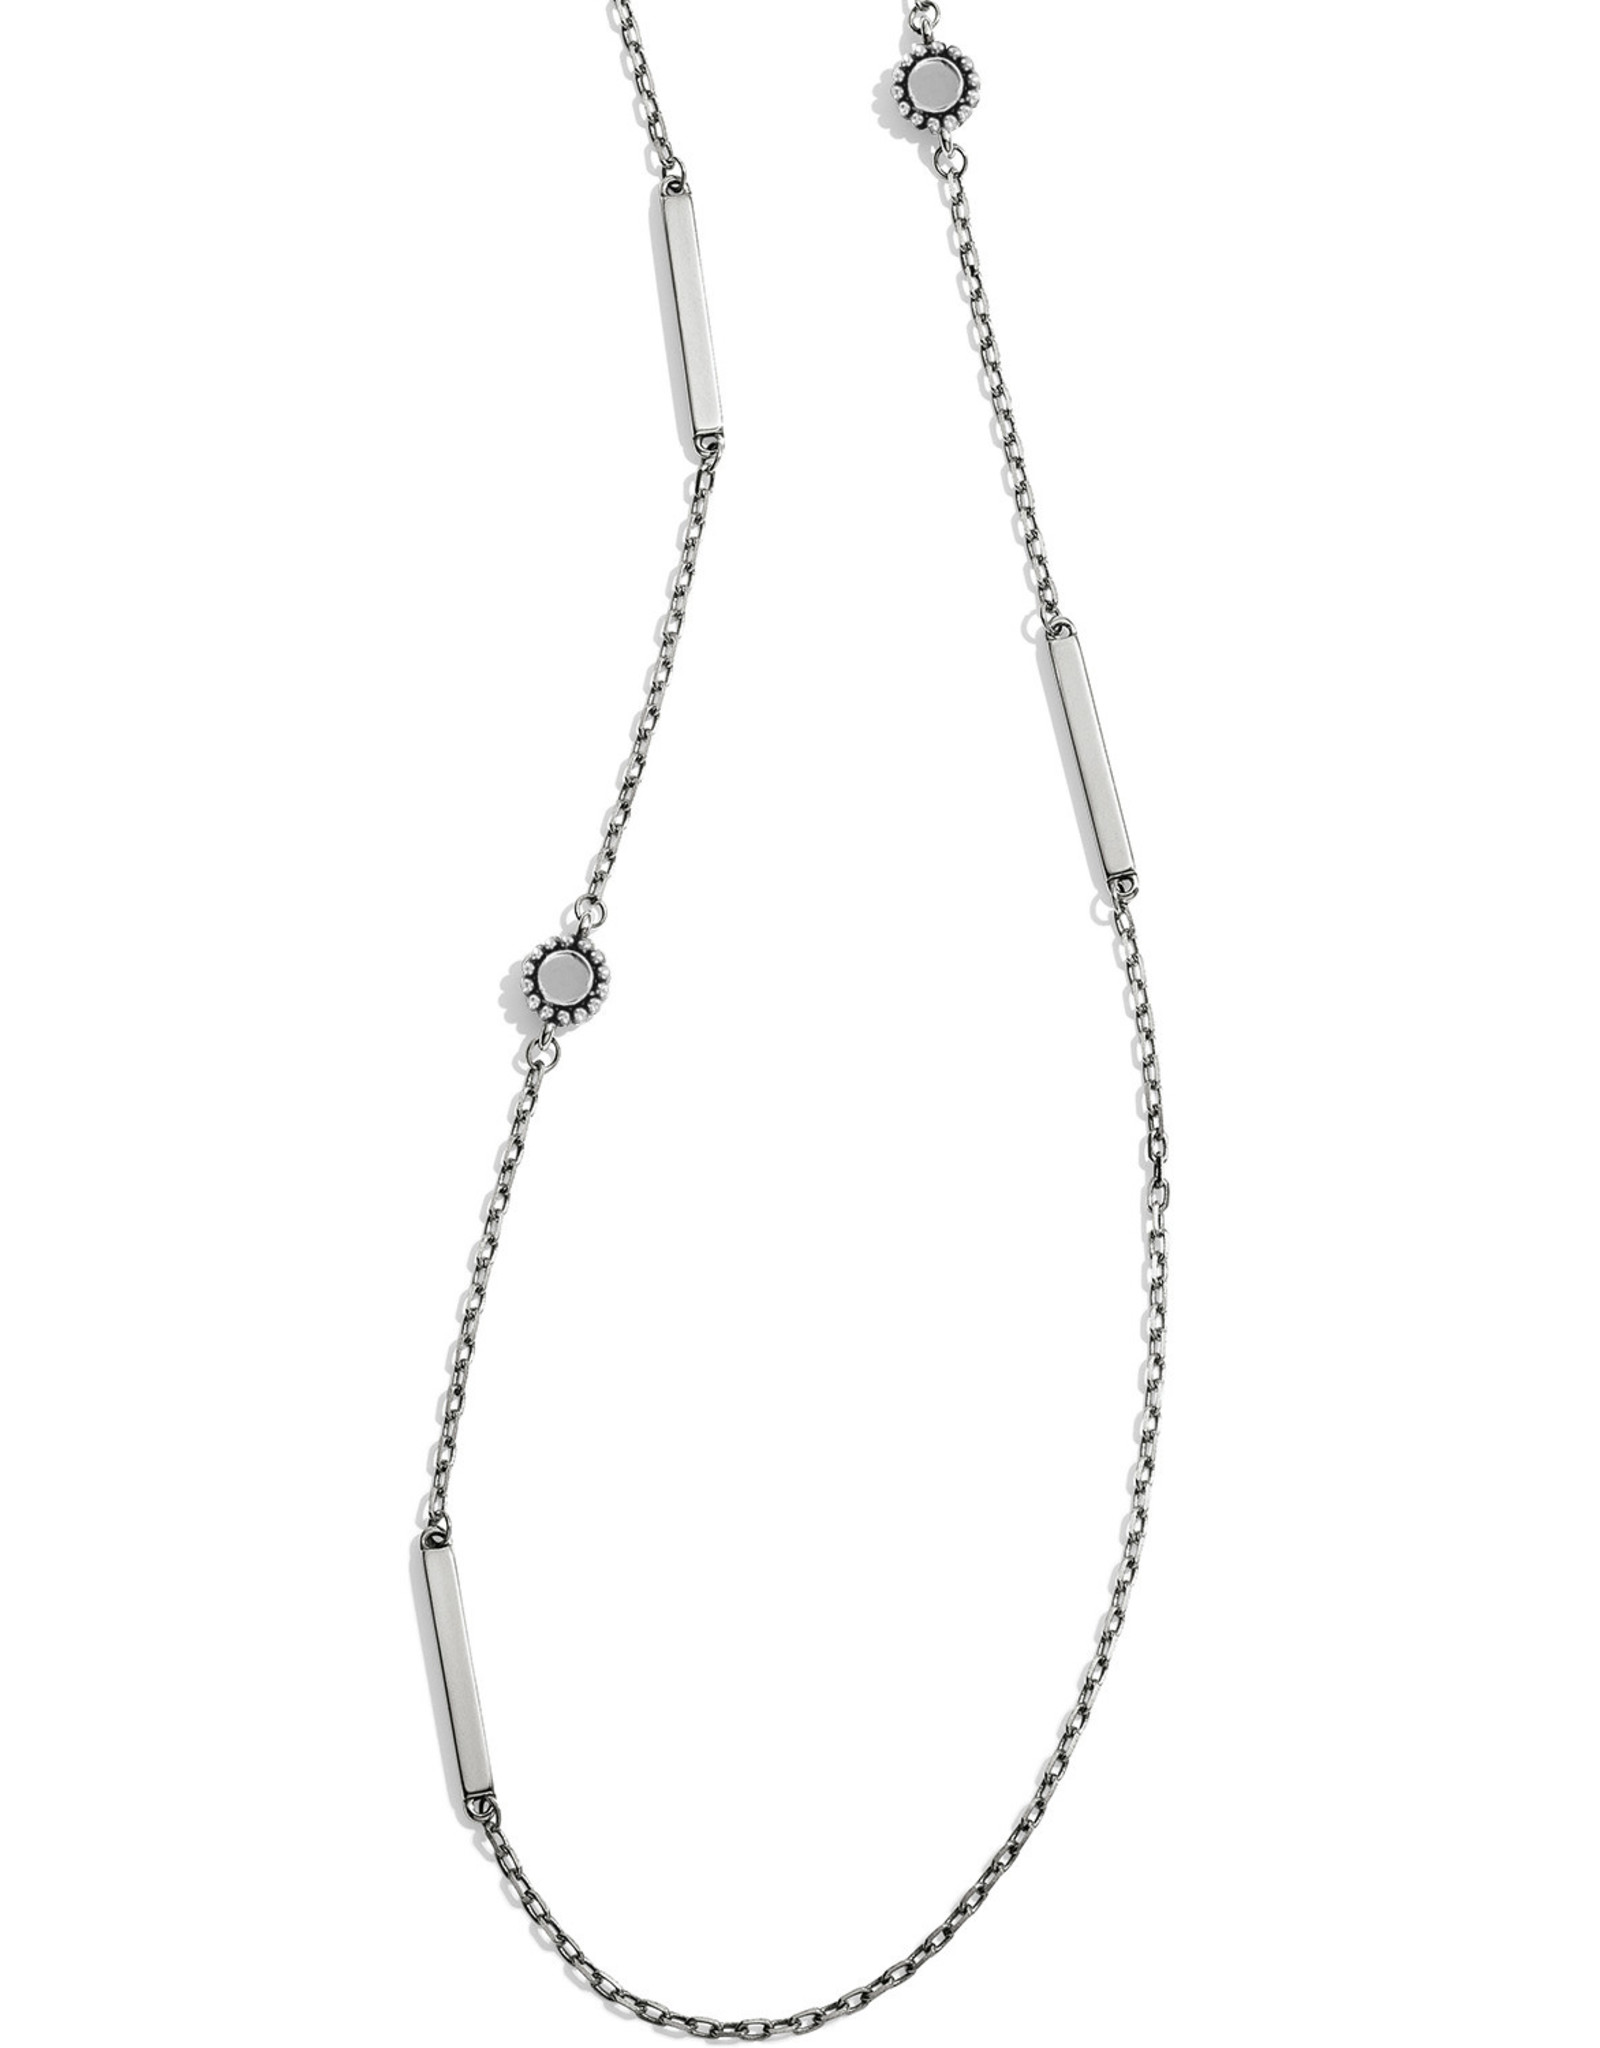 Brighton Brighton Twinkle Long Necklace